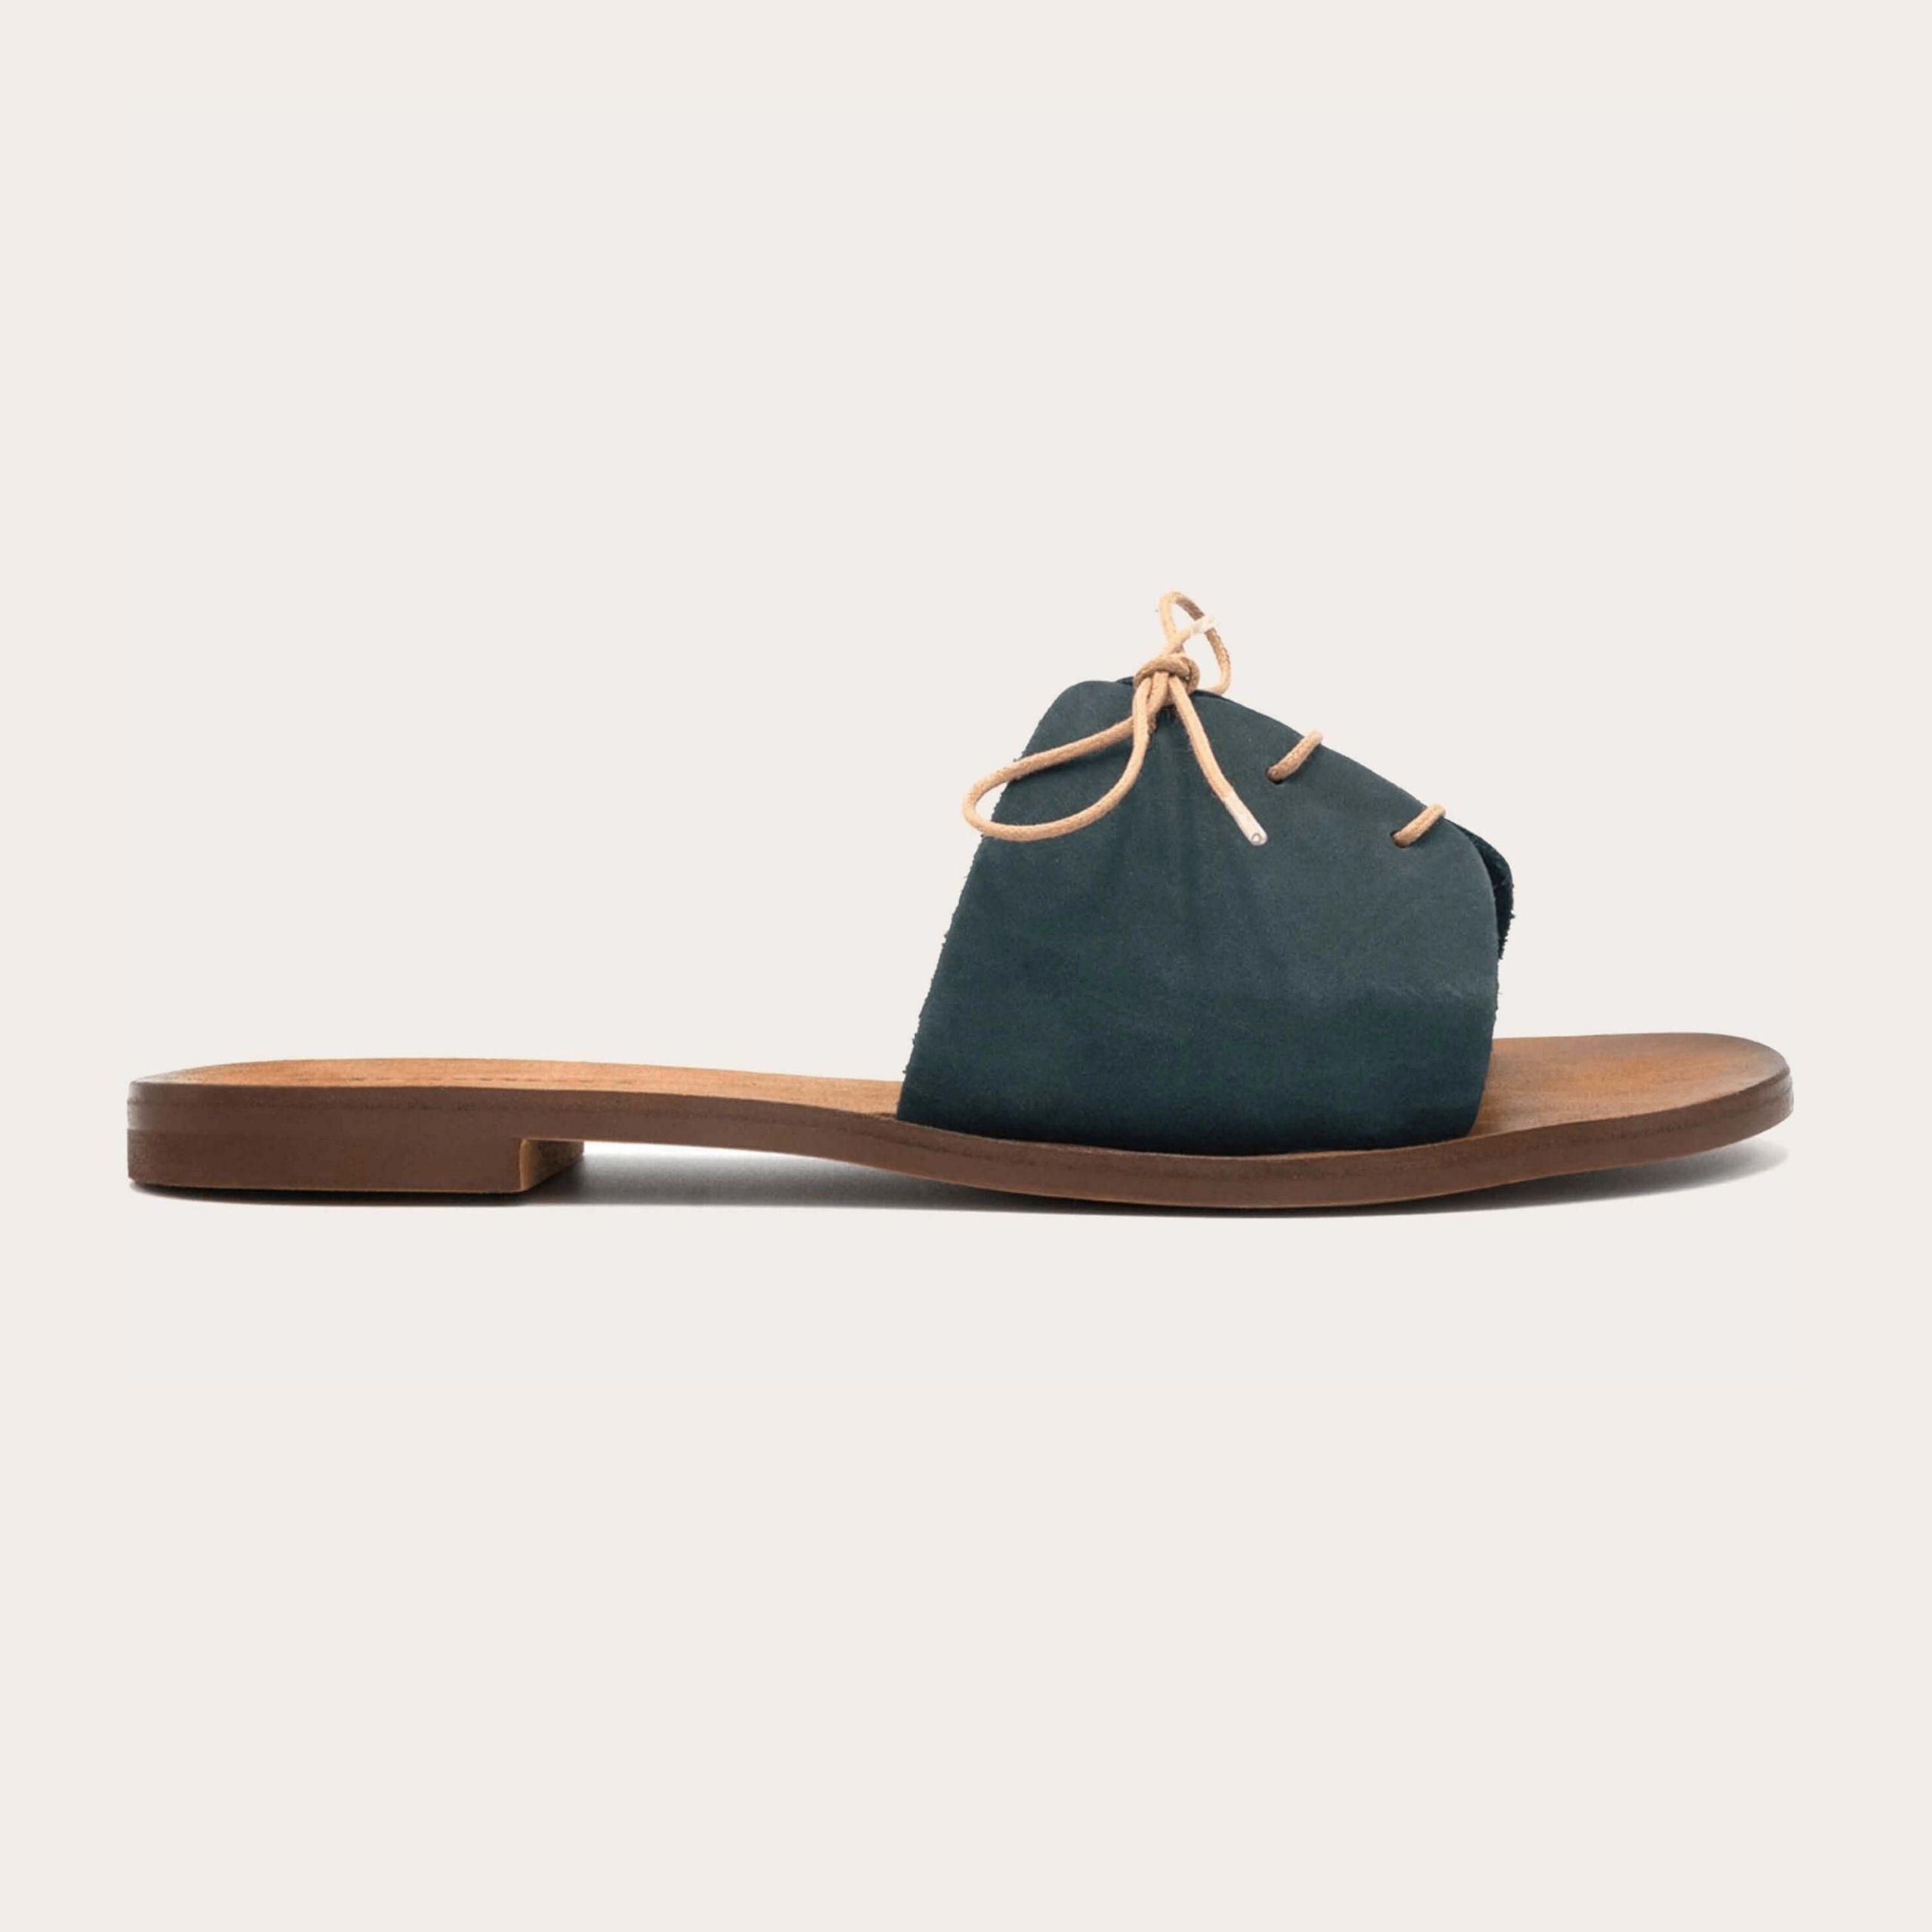 cali-blue-1_lintsandalen sandals travelsandals vegan sustainable sandals wikkelsandalen